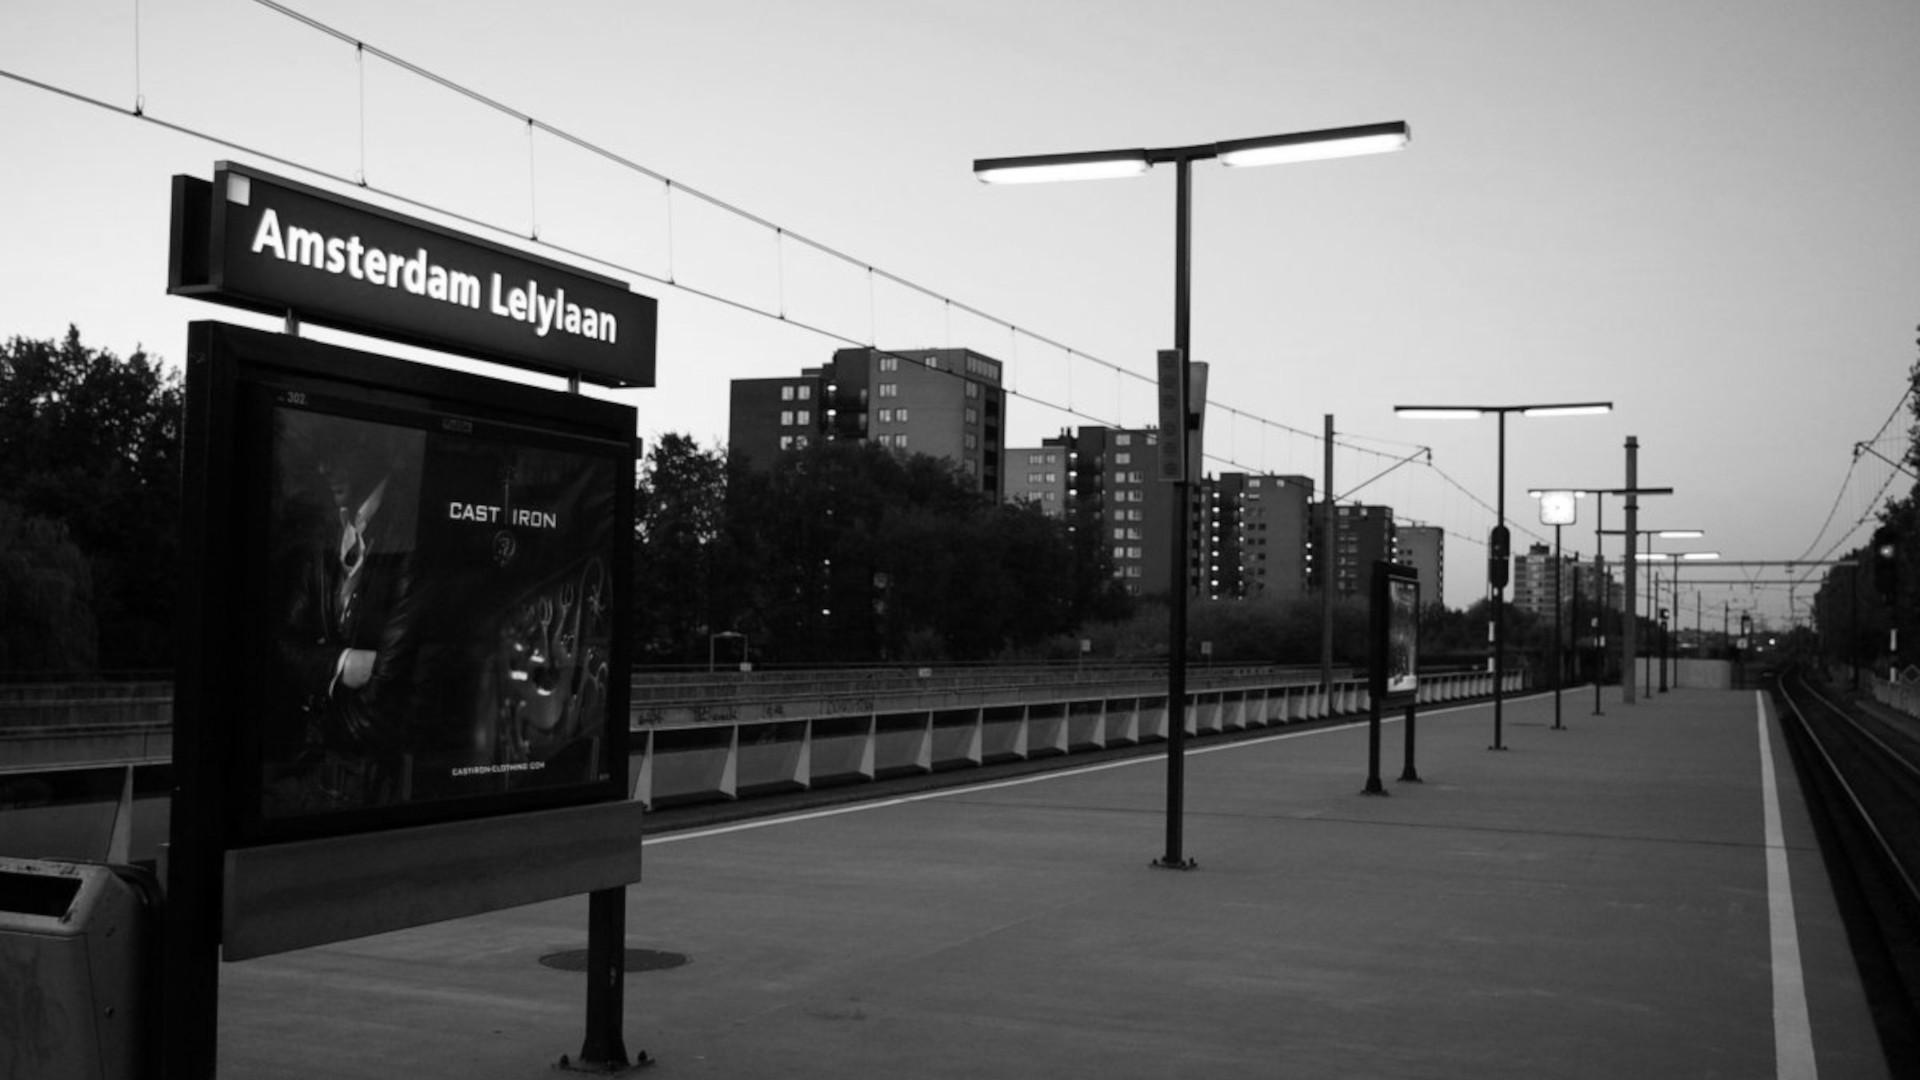 19108 Station Lelylaan Laserscanning Leap3D grijs.jpg